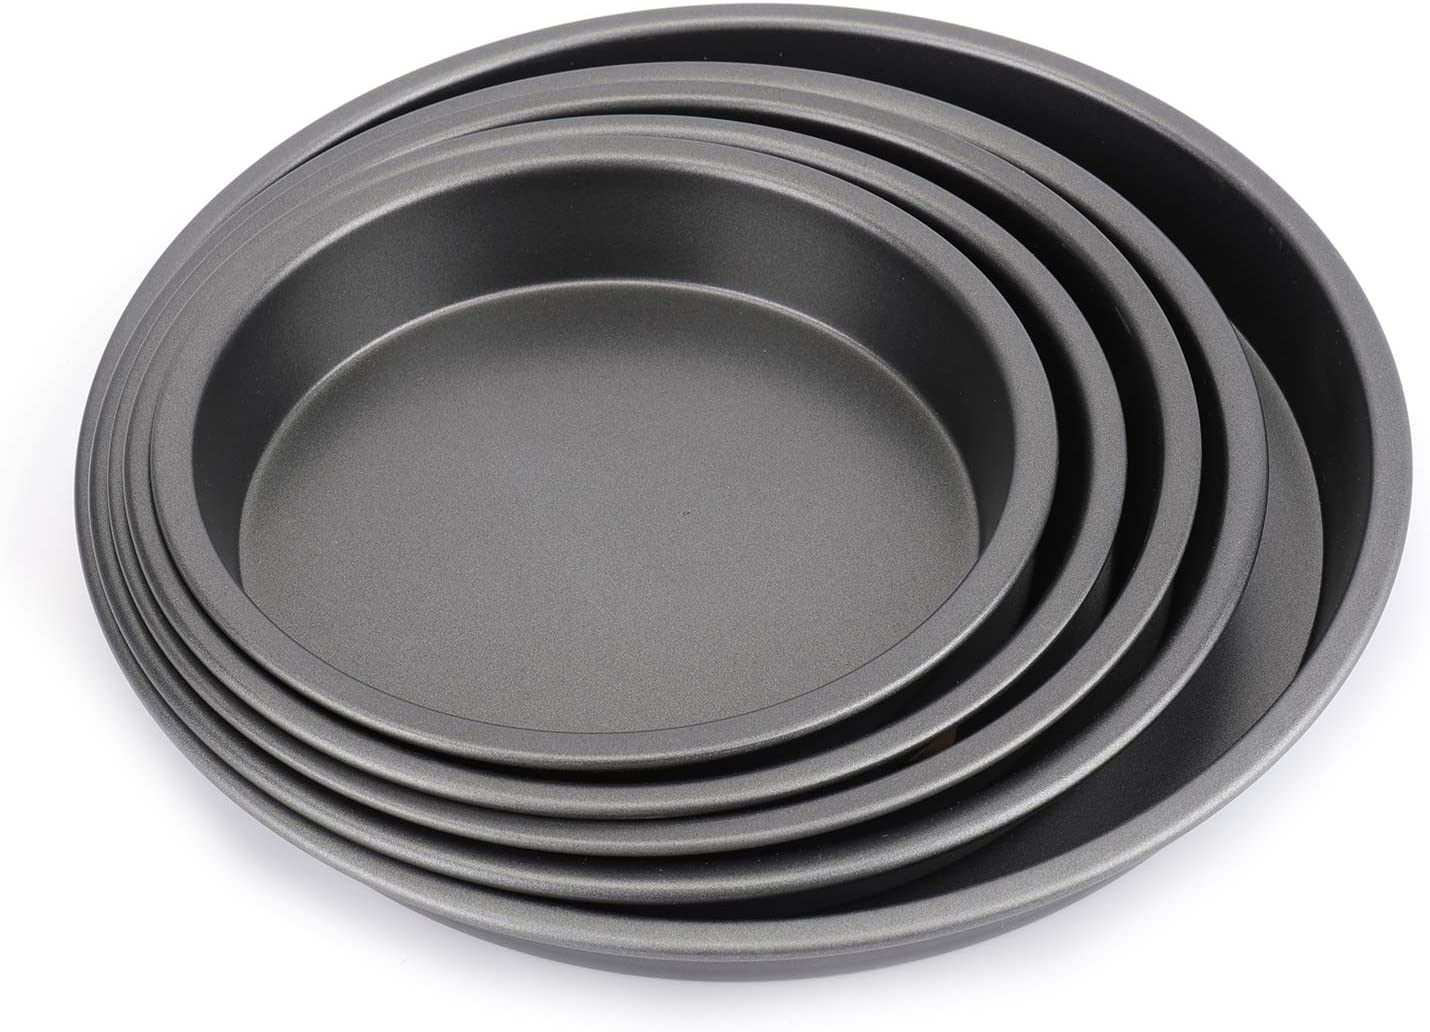 Bekith 5-Piece Set Pizza Pans, Non-stick Deep Dish Round Bakeware